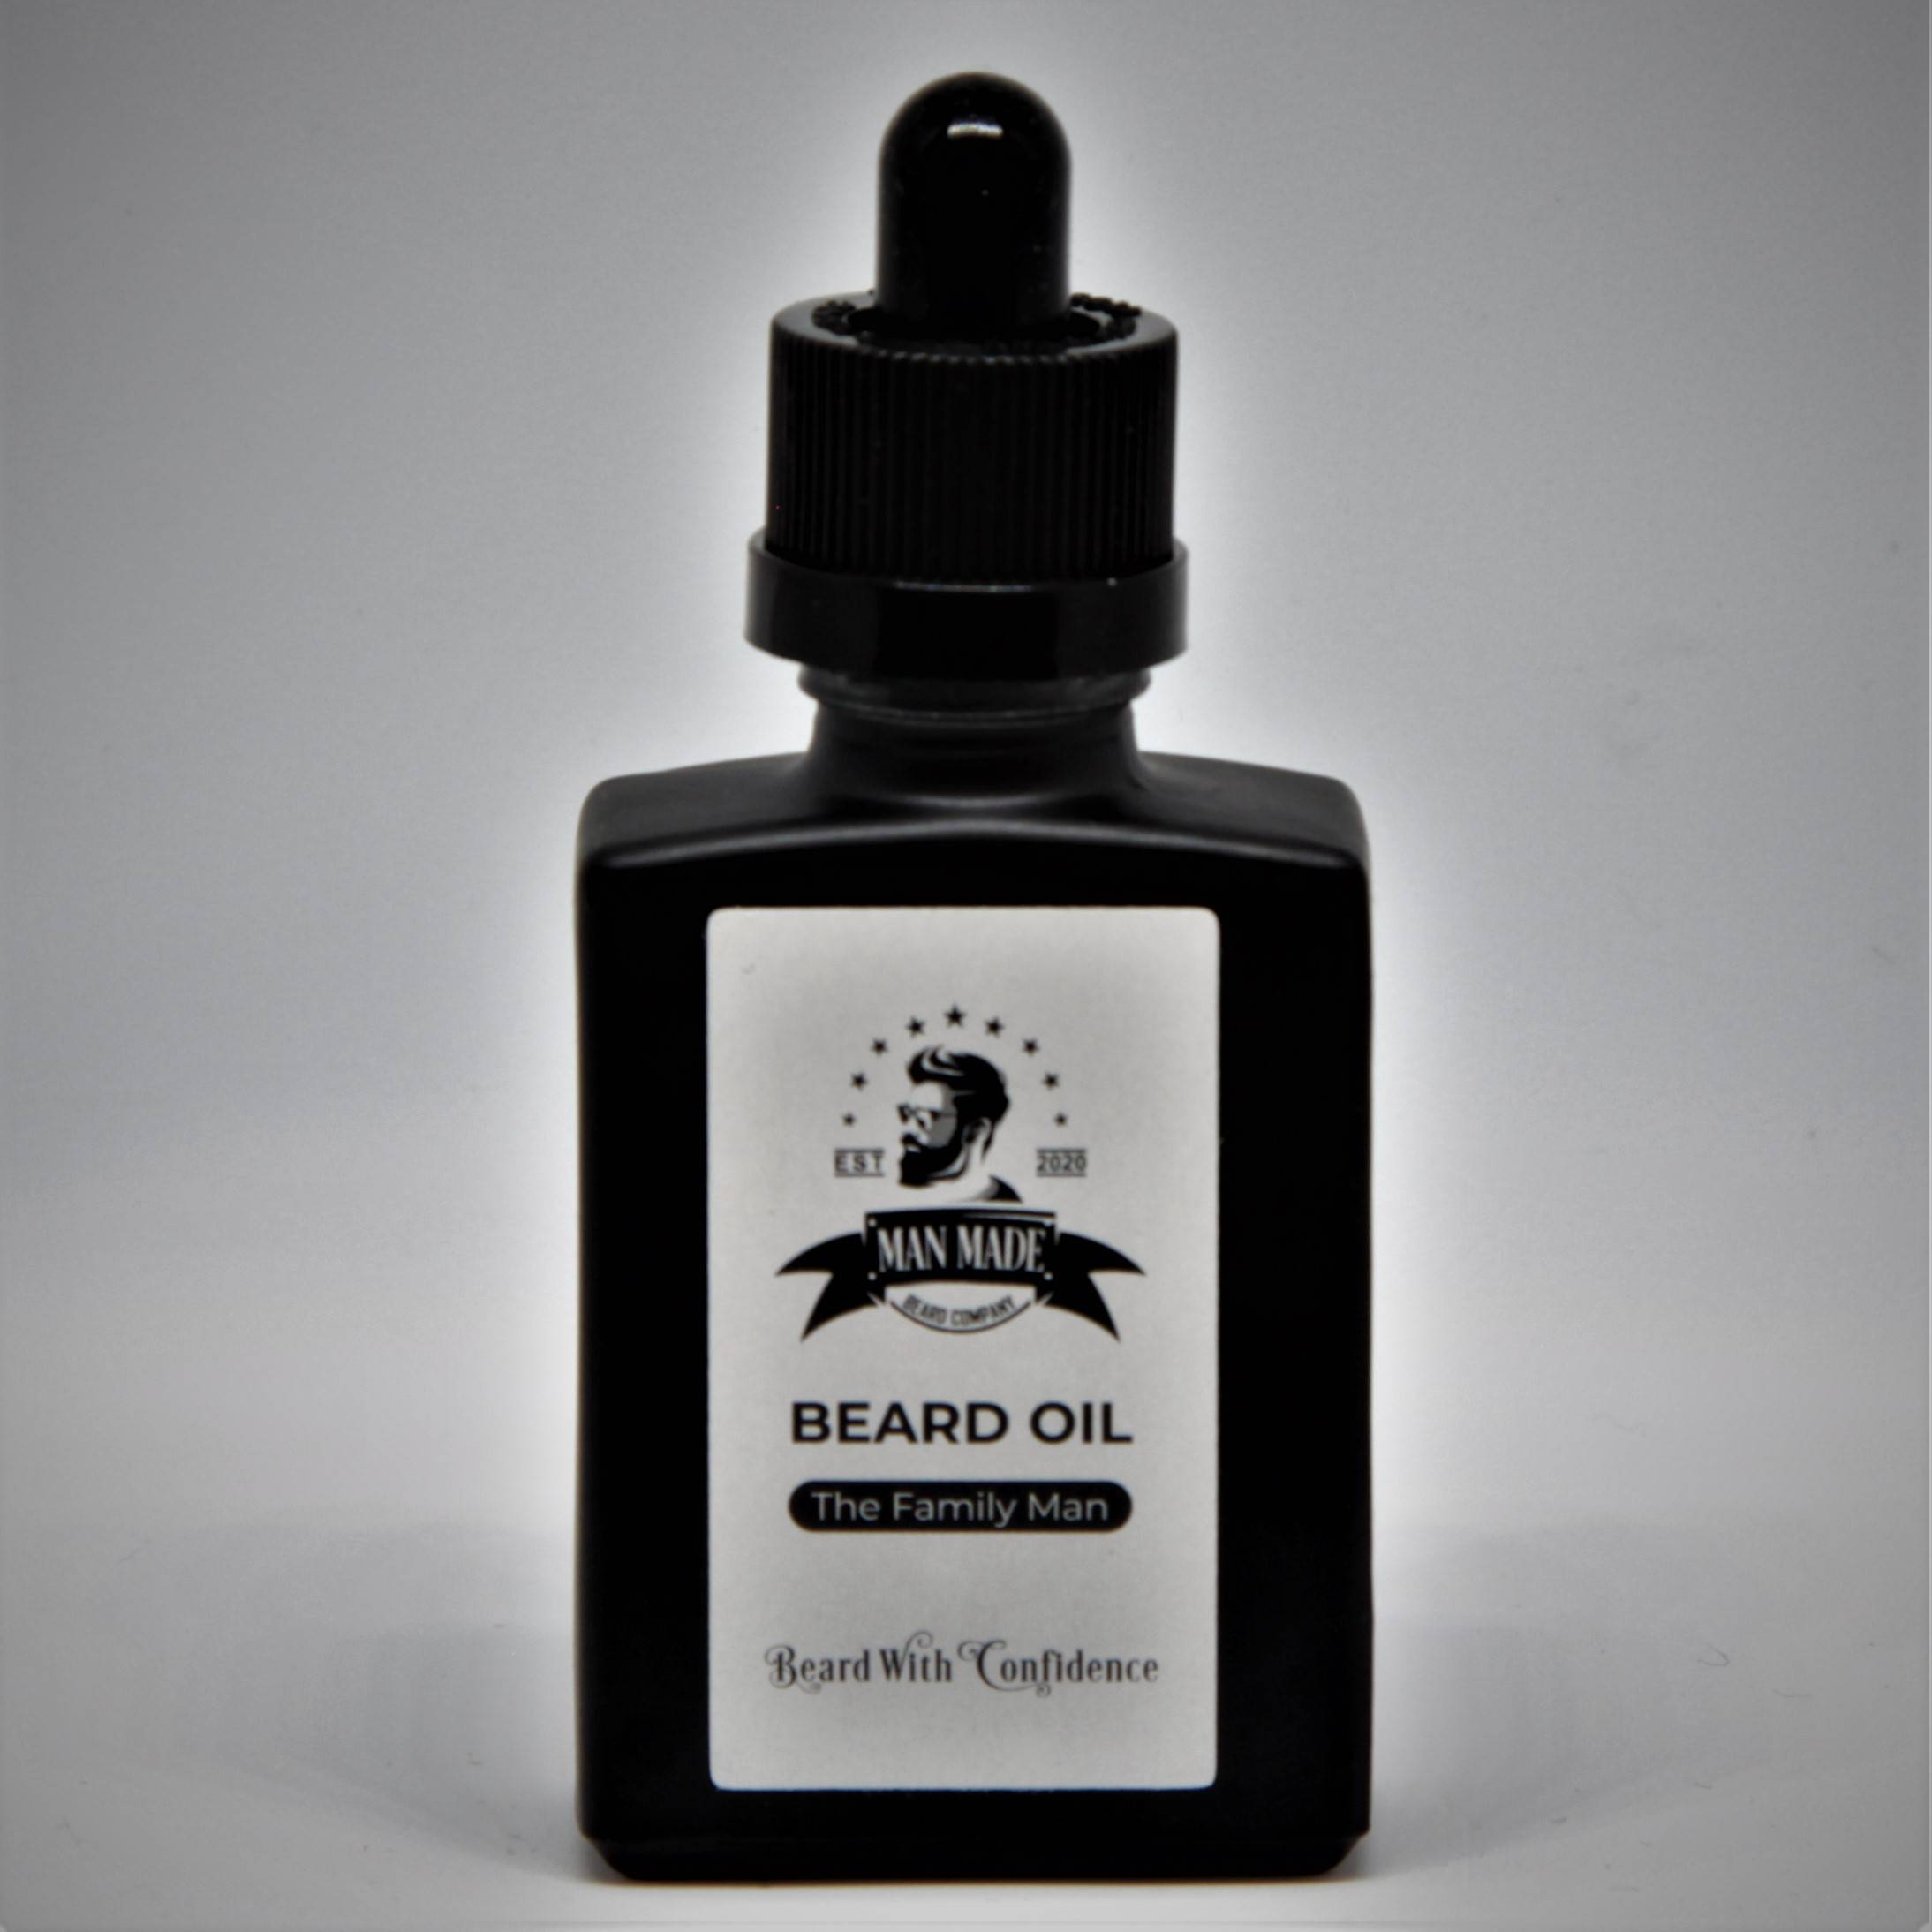 The Family Man Beard Oil